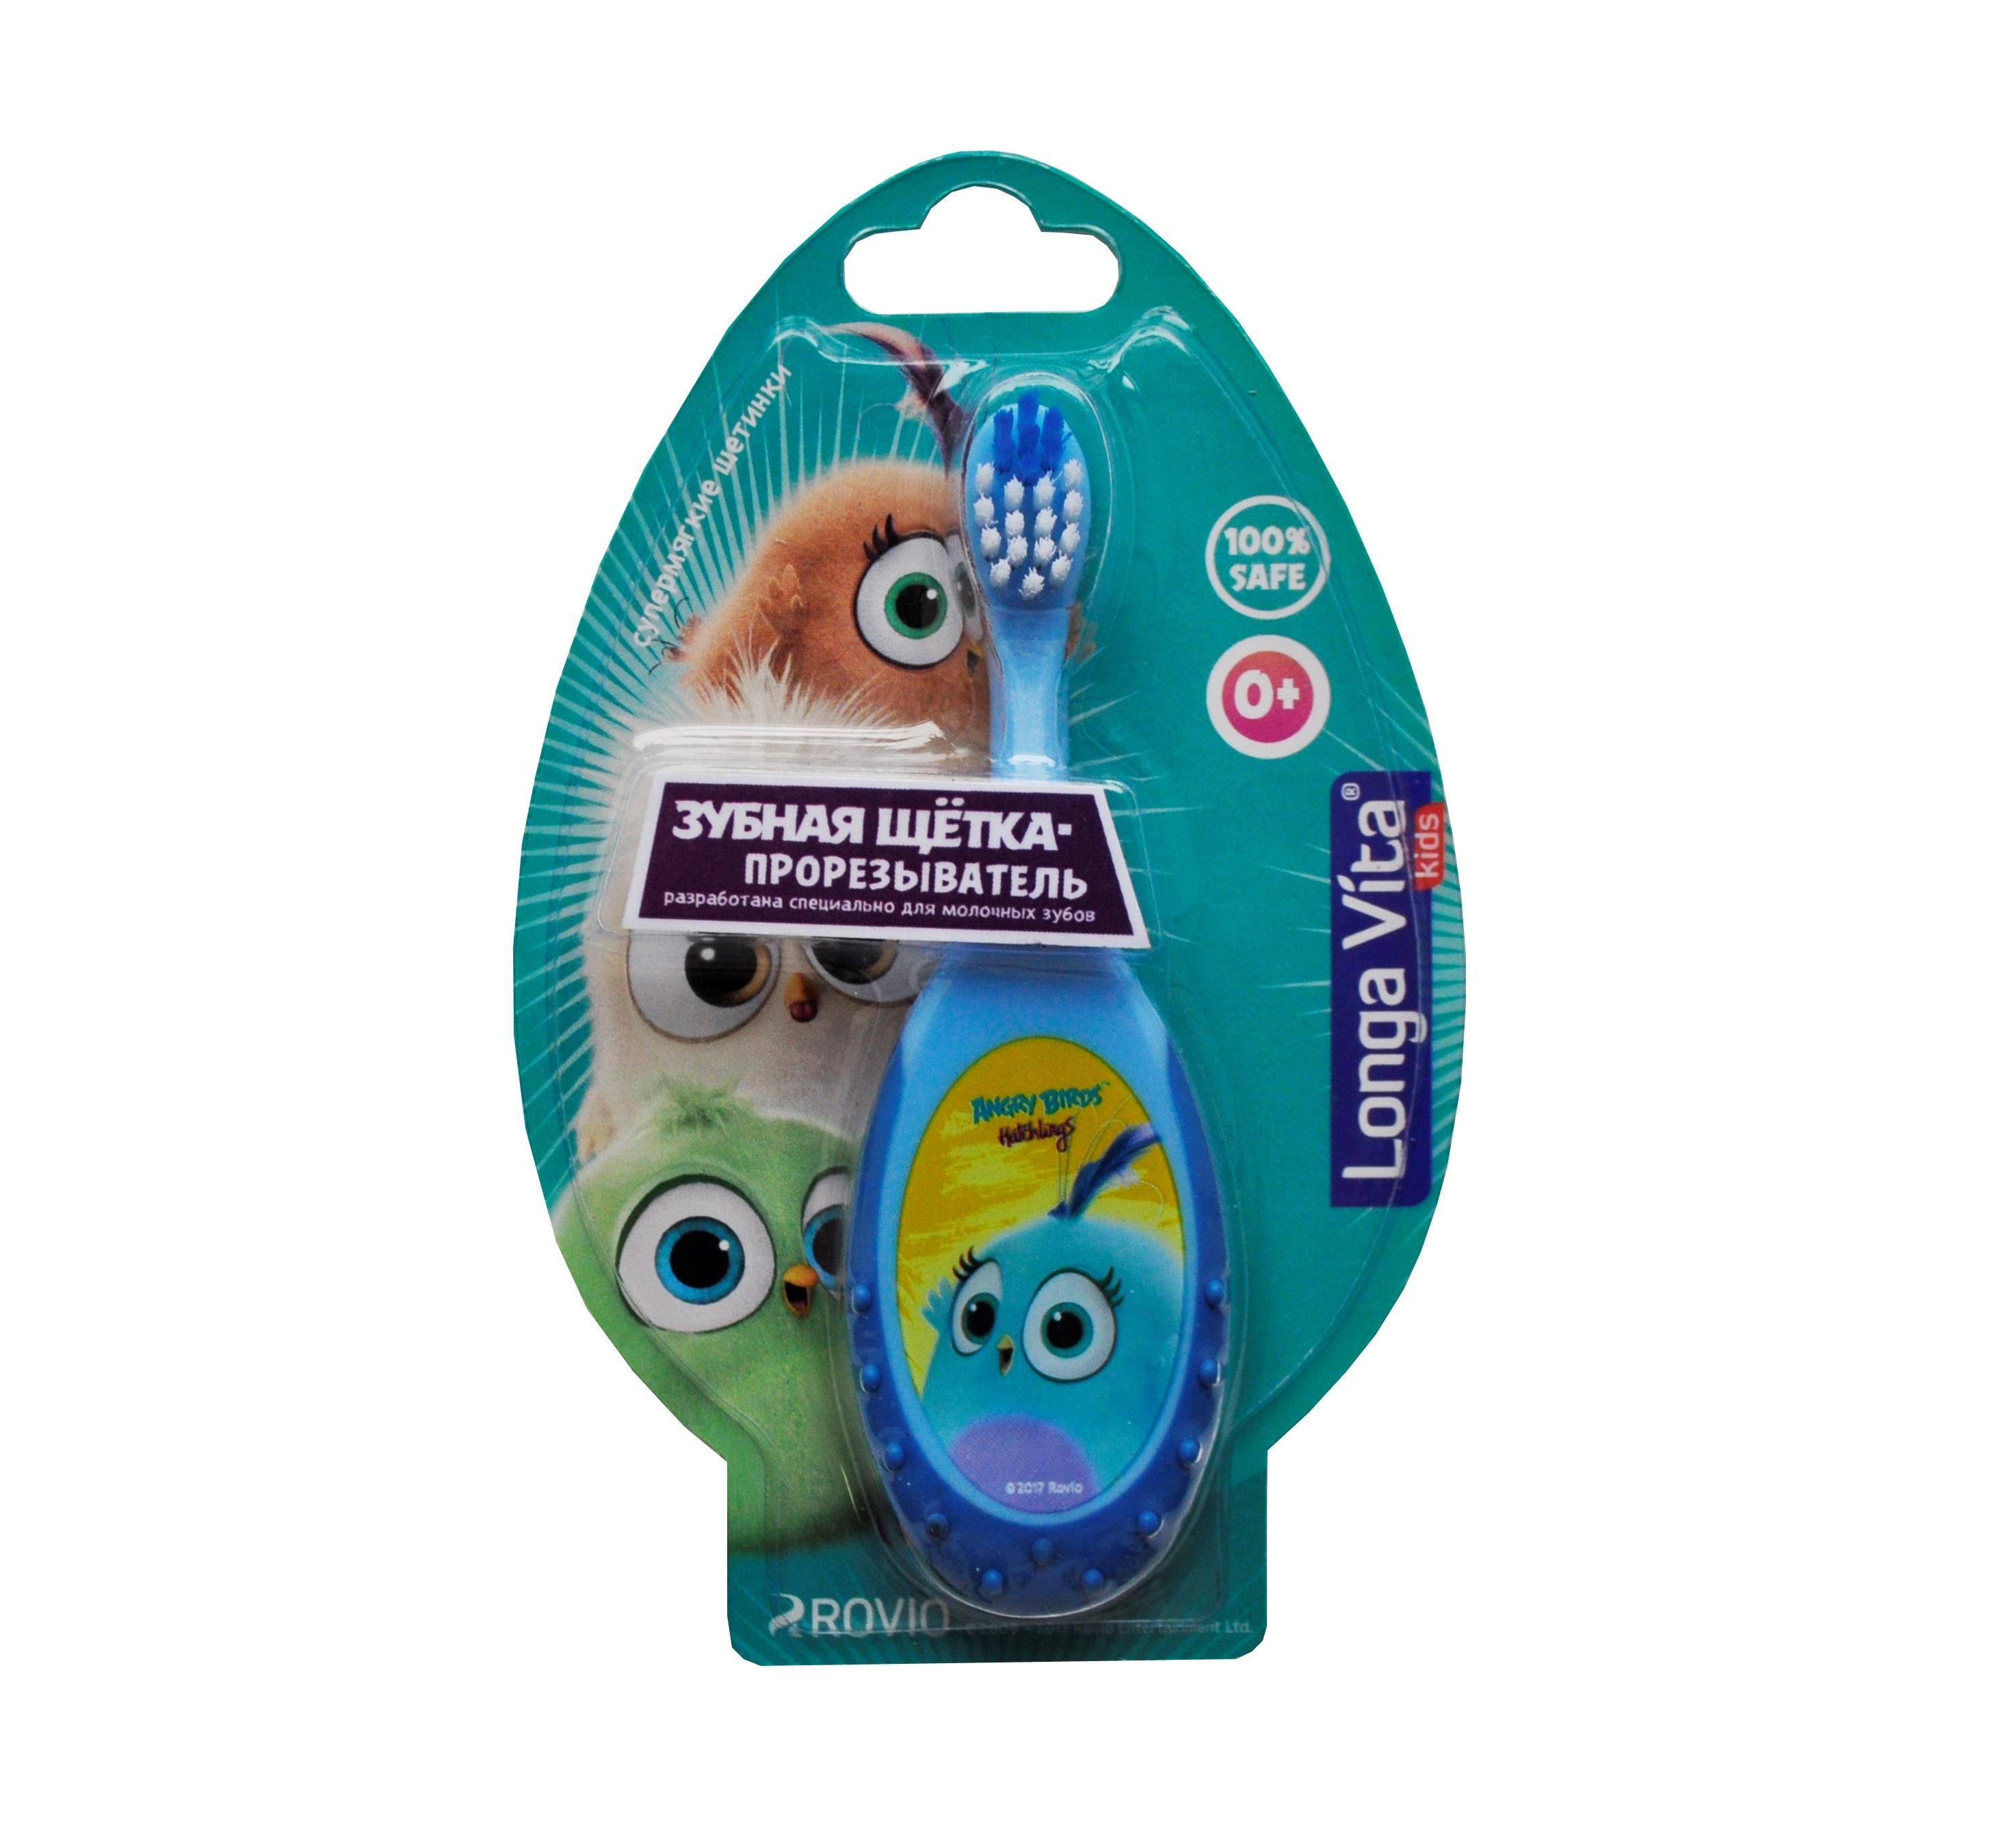 Зубные щетки и пасты LONGA VITA Angry Birds. Hatchlings longa vita детская зубная паста angry birds bubble gum от 3 х лет 75 гр